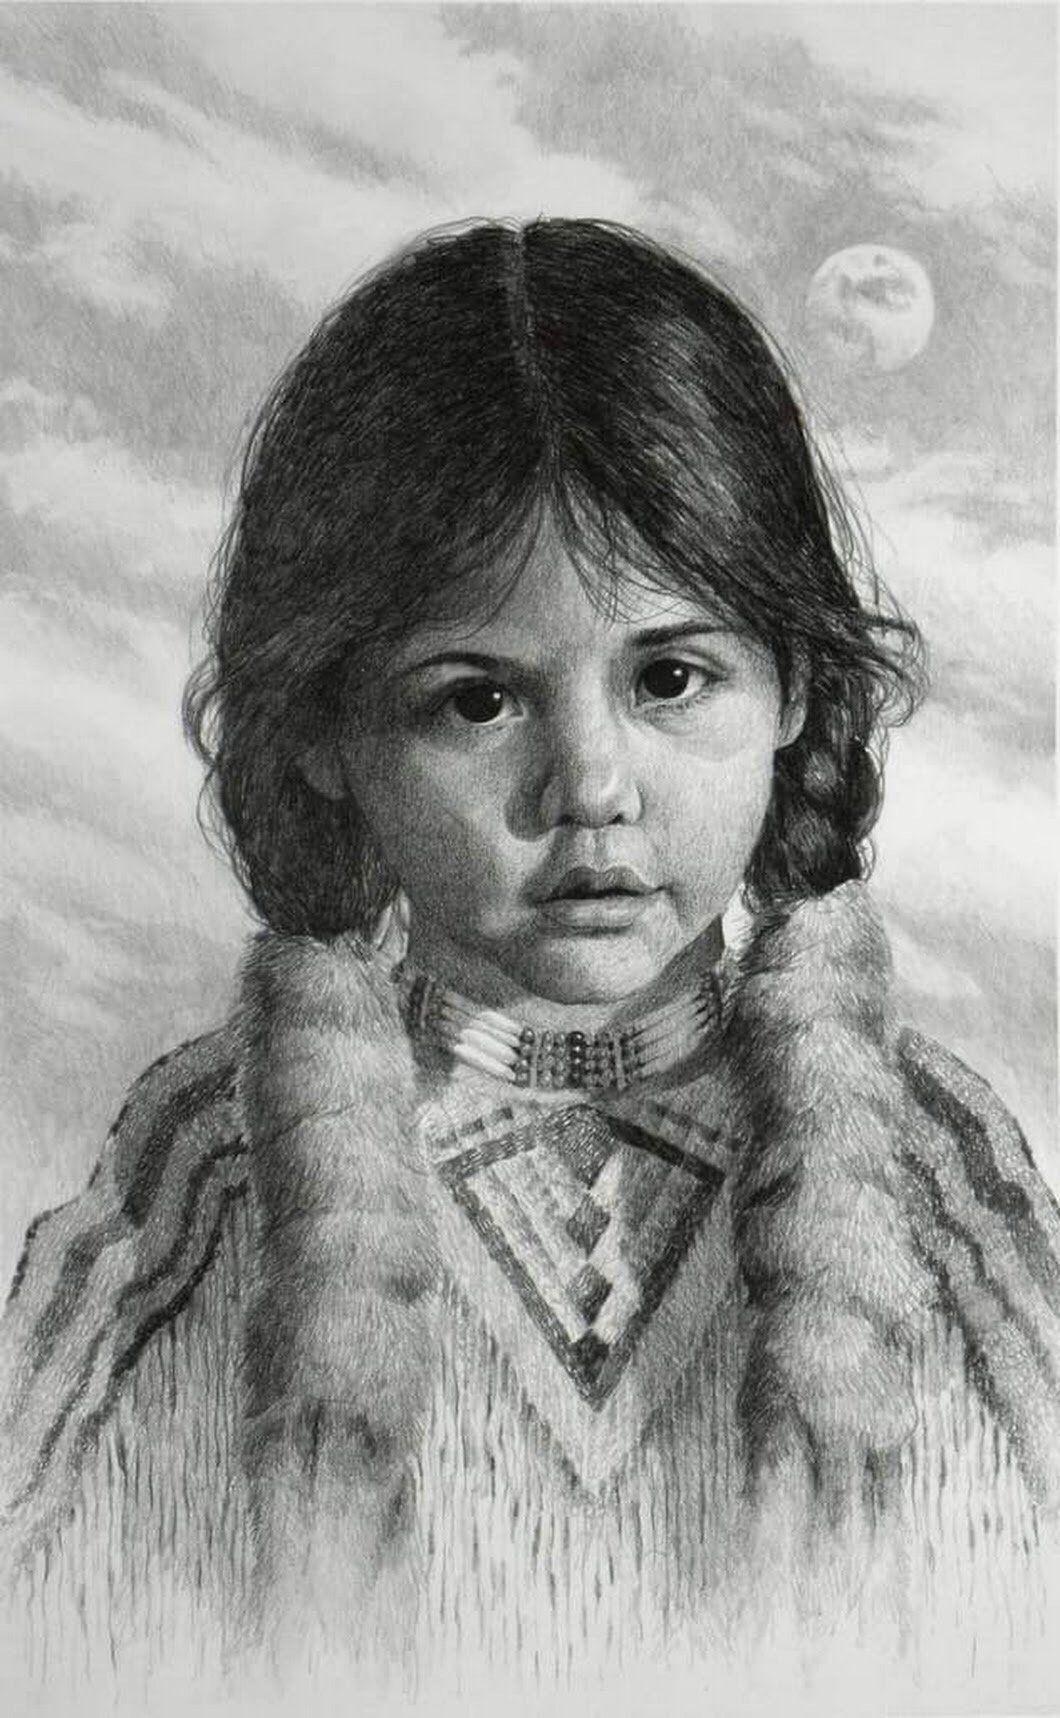 Https Www Amazon Com Photos Share Sxc1ip4xavnzn9fhilwuhgvvzden38s9ssdjwh1b3h9 American Indian Art Sketch Painting Native American Indians